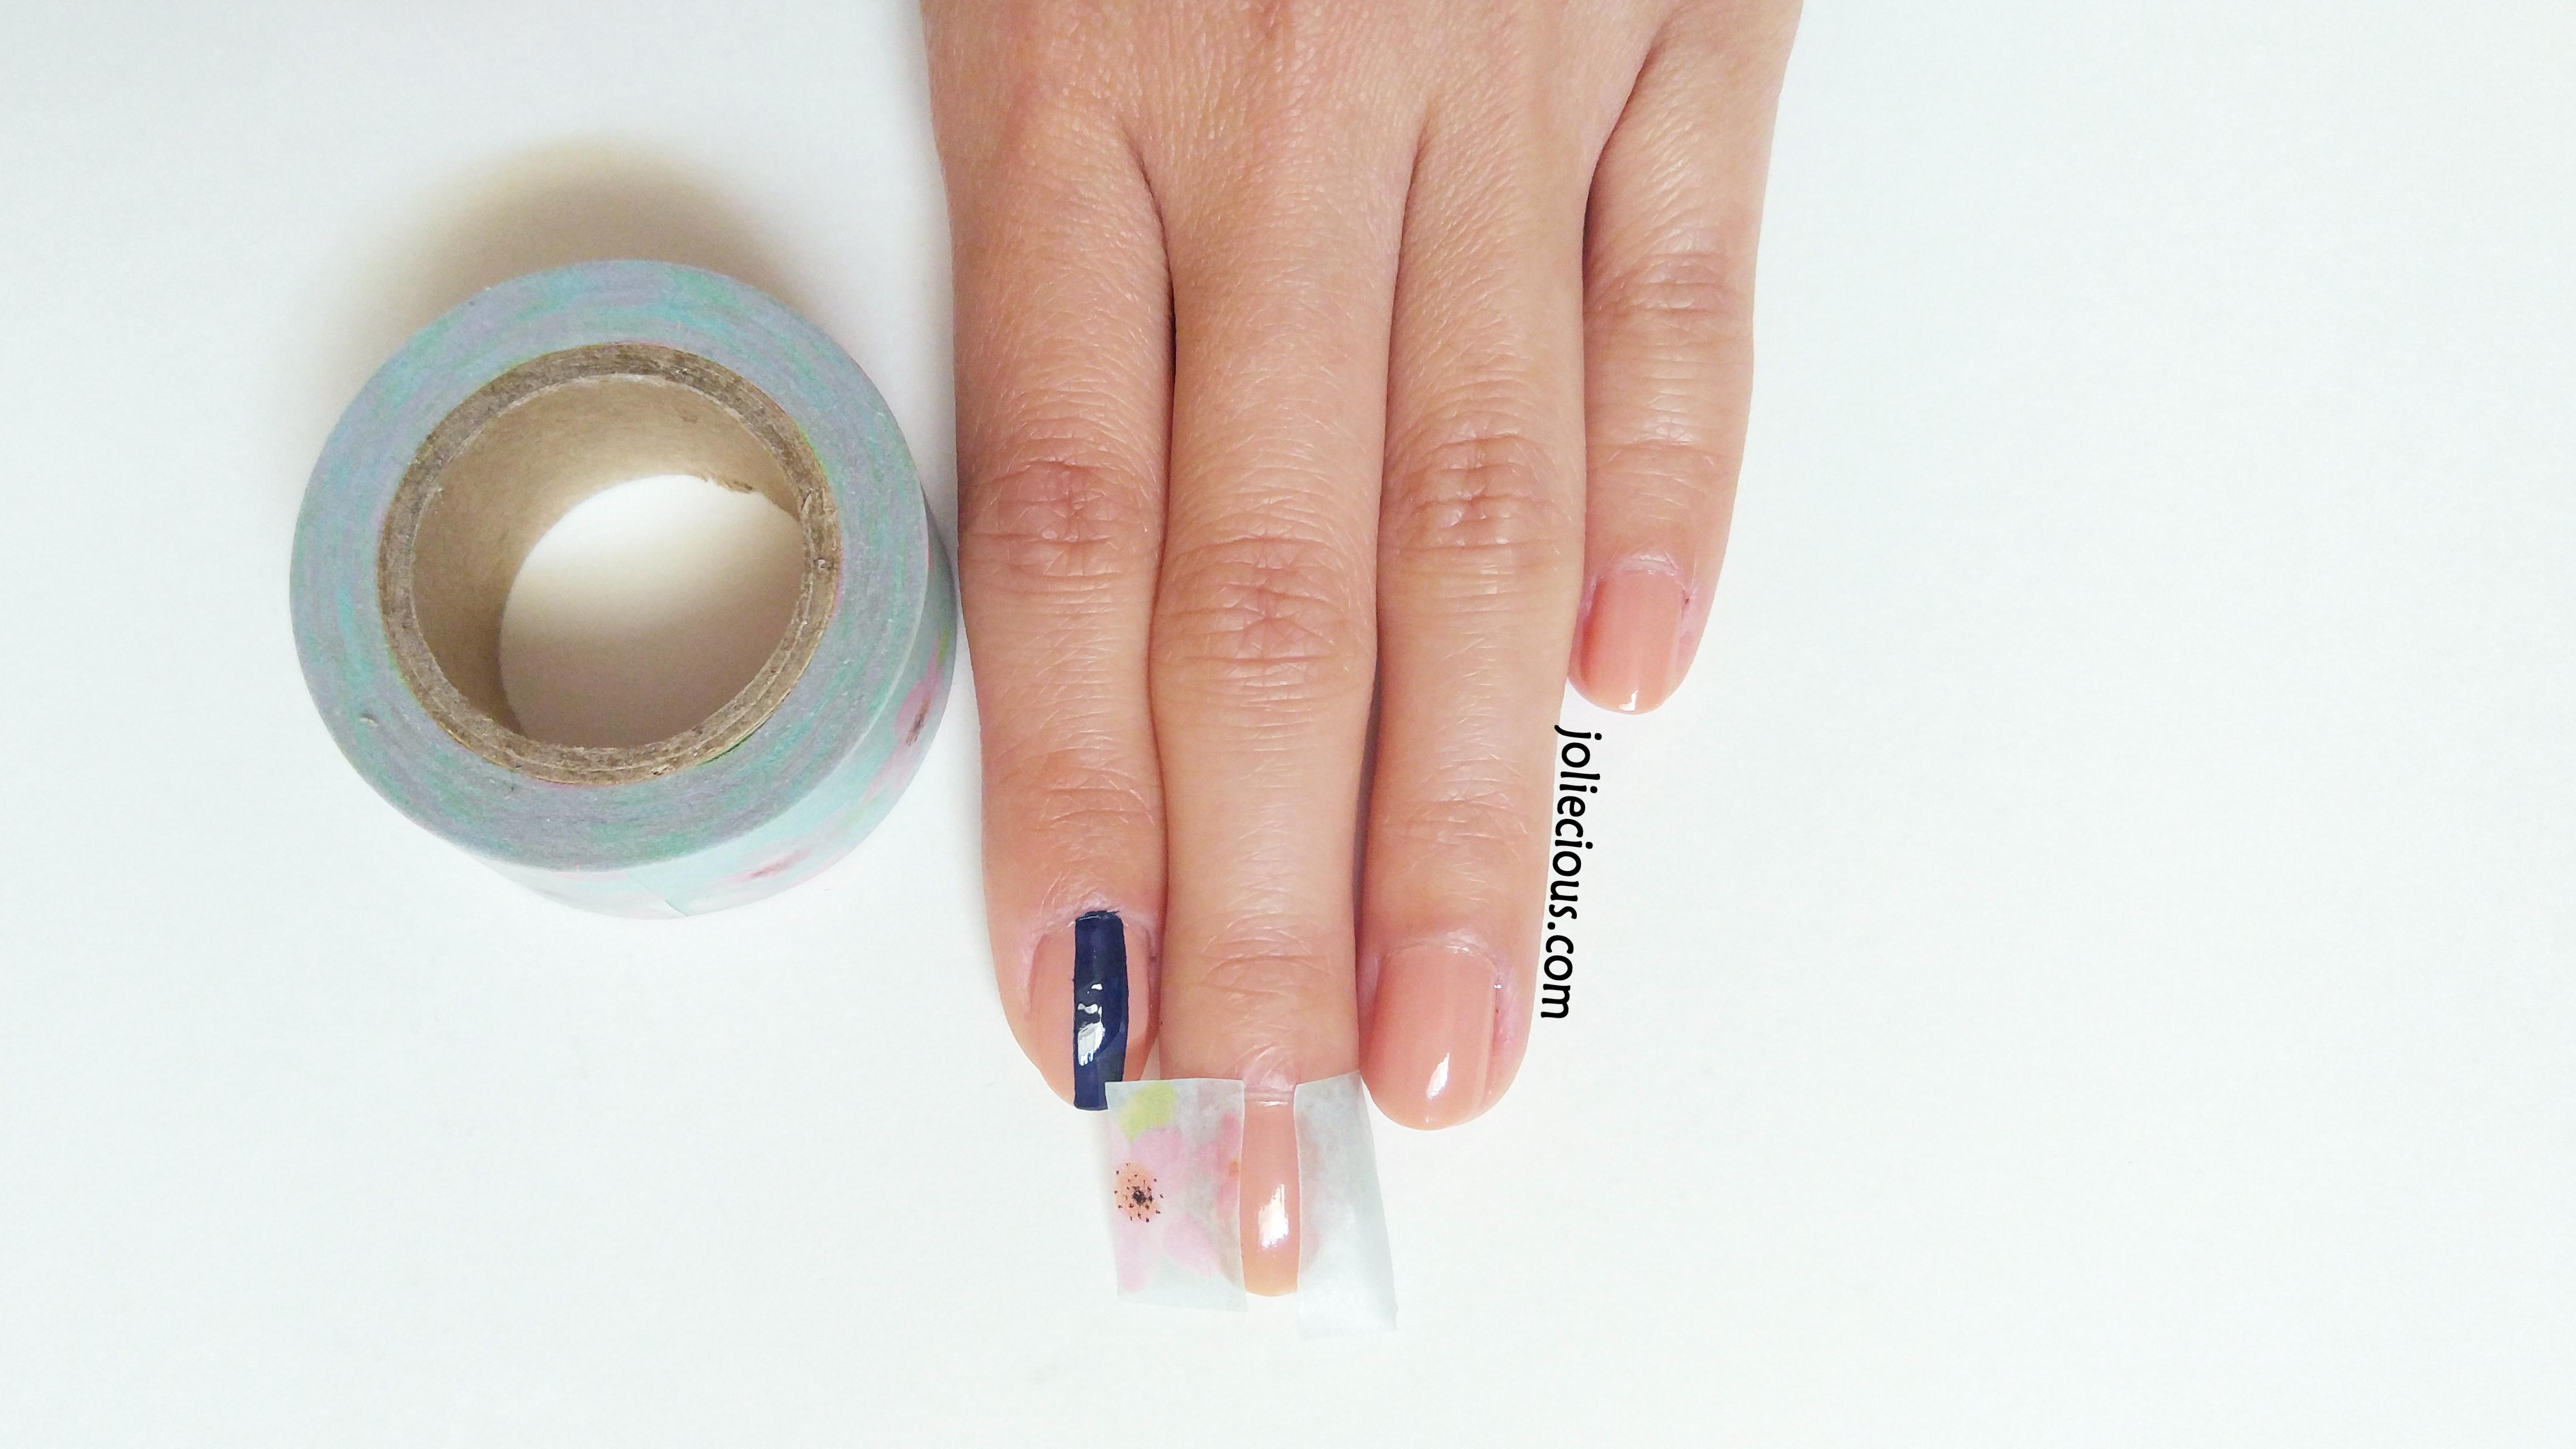 High heel nails - tape